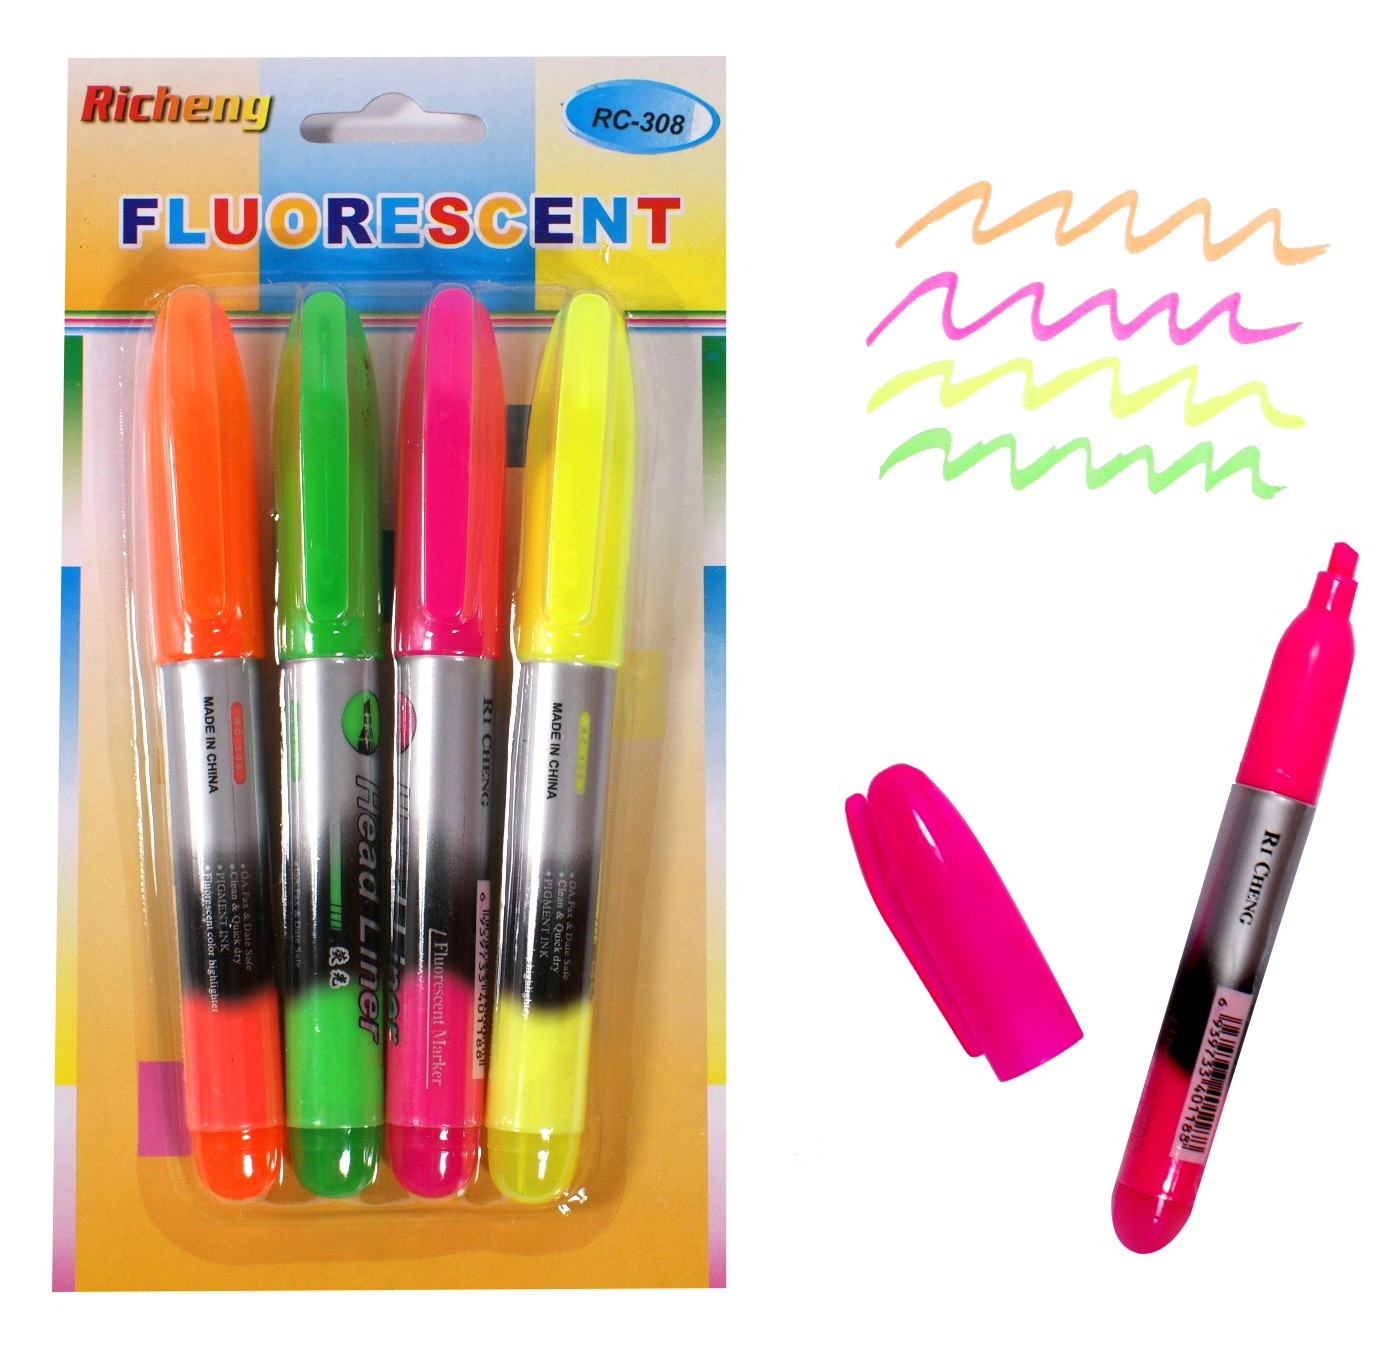 Pisaki fluorescencyjne kpl. 4 szt